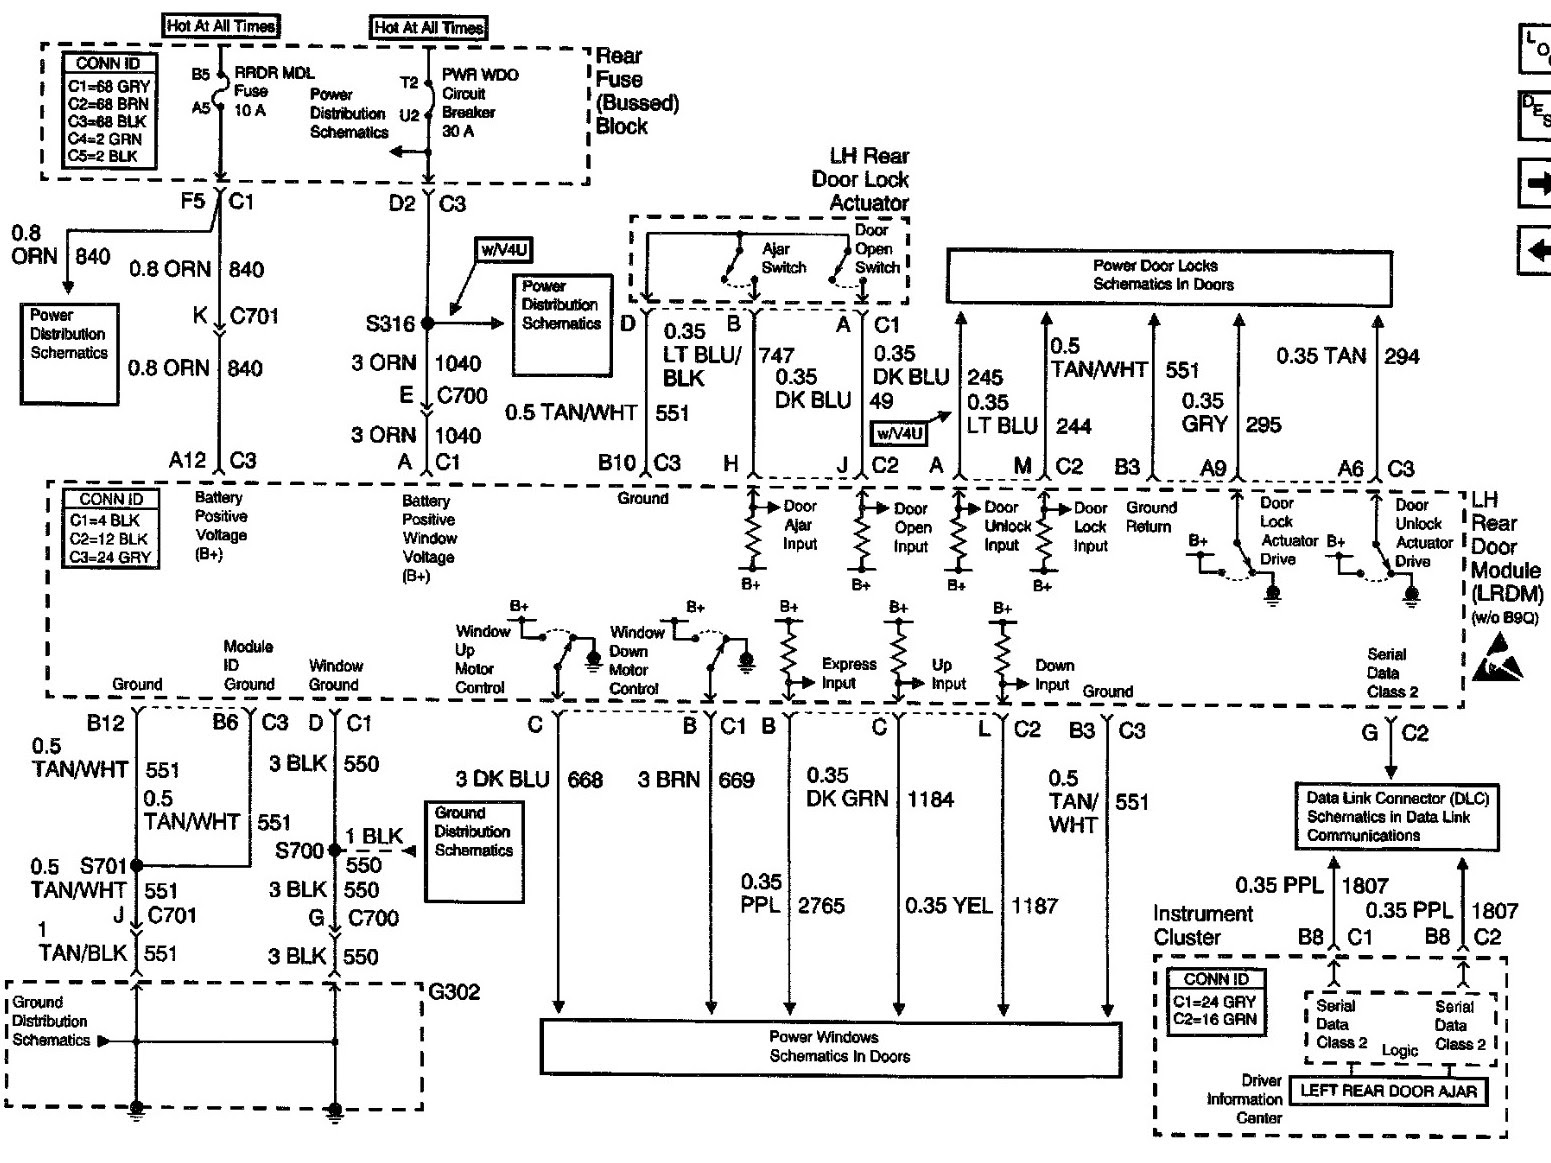 Cadillac Lights Wiring Diagram | back-speed Wiring Diagram union -  back-speed.buildingblocks2016.euBuilding Blocks 2016